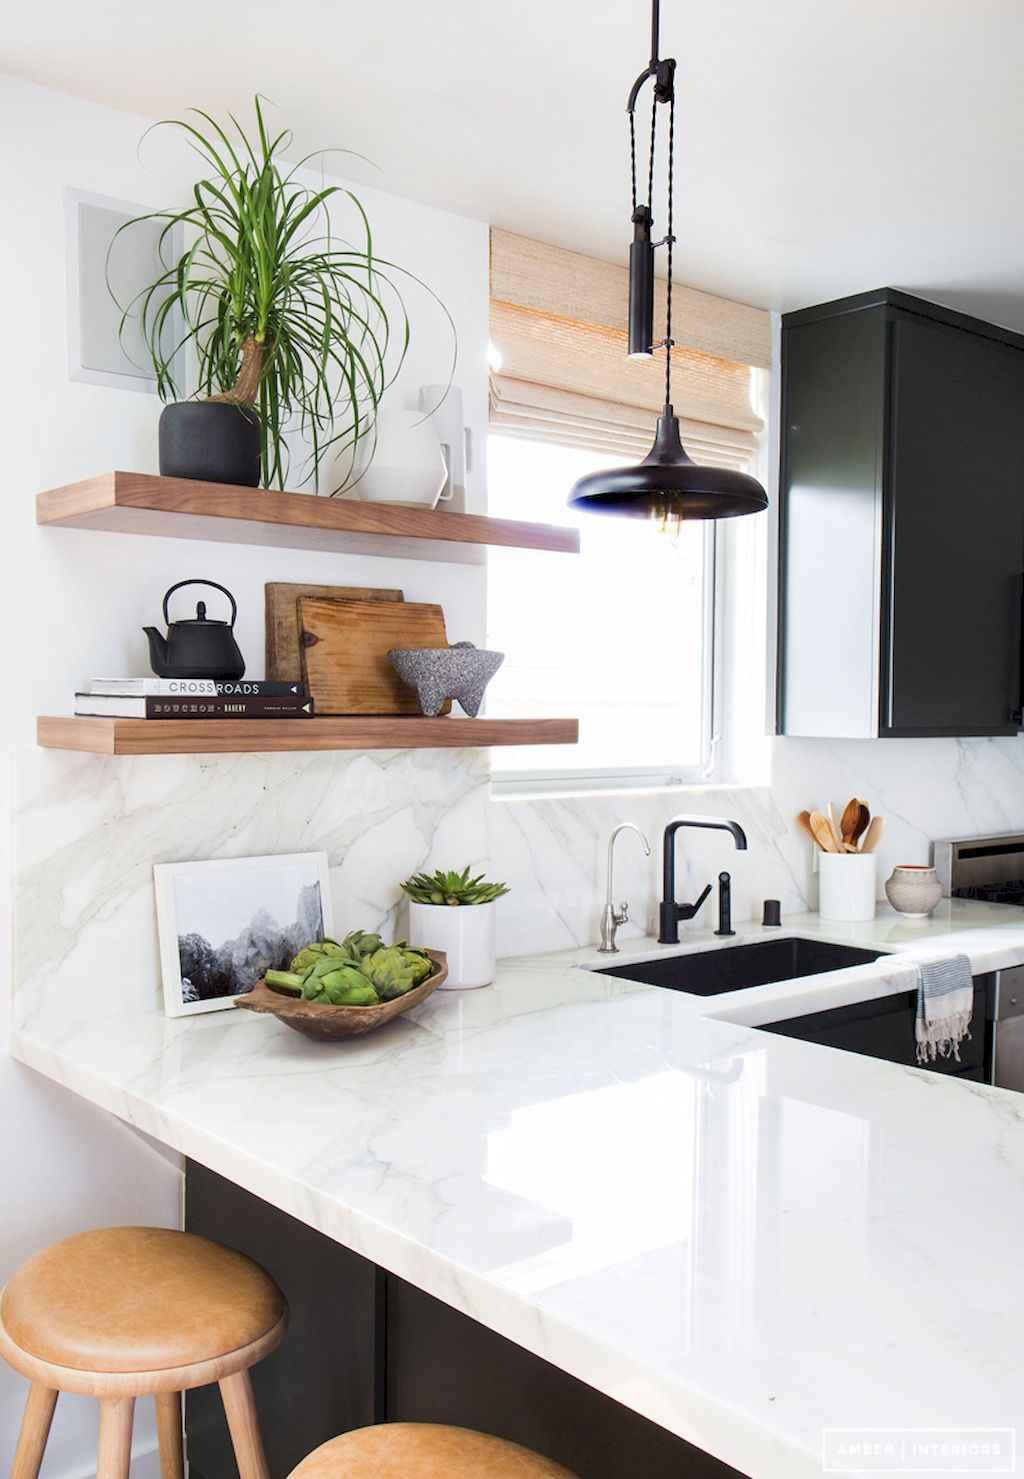 Mid century modern kitchen design ideas (35)